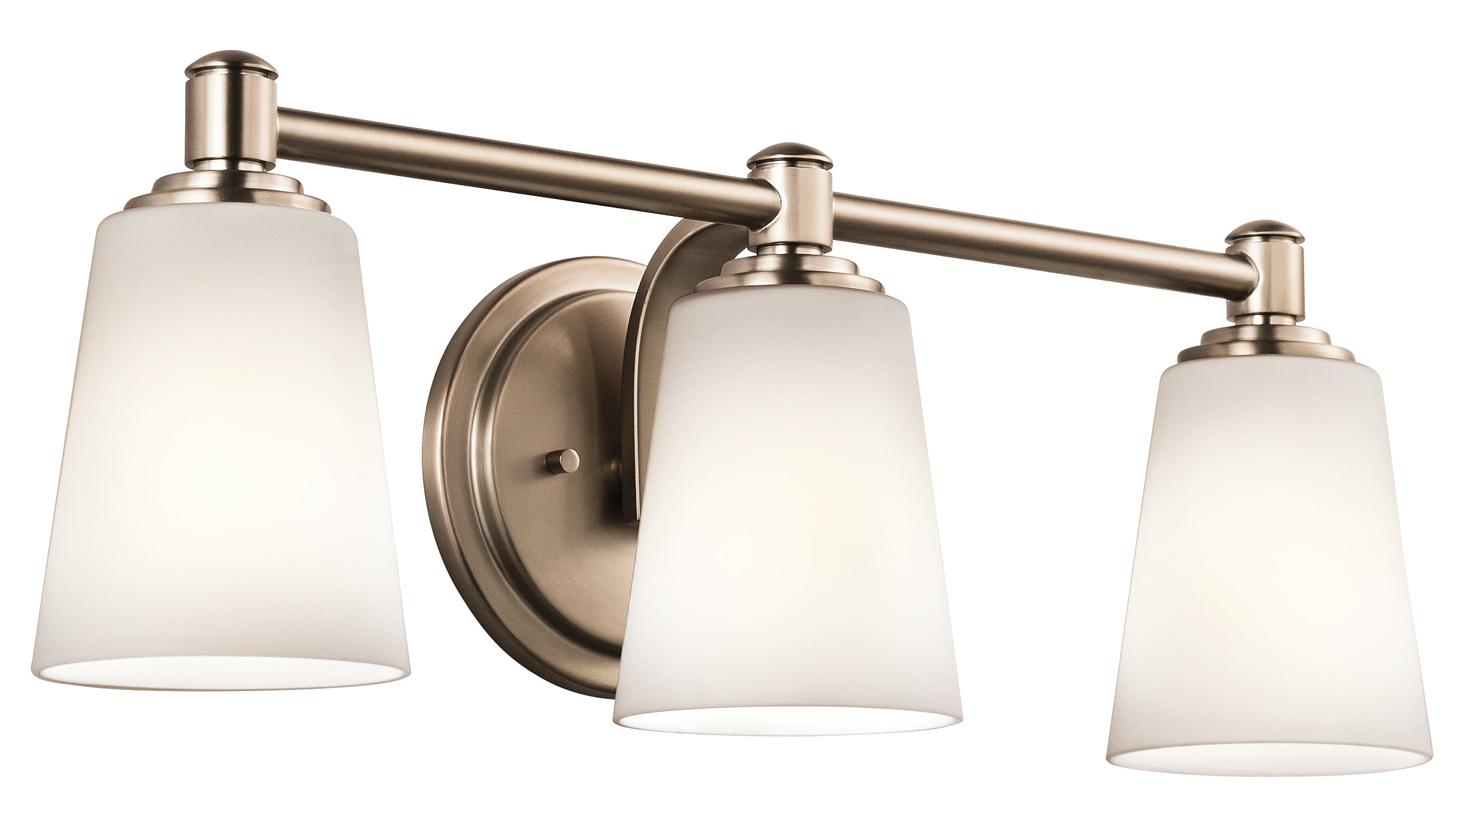 Kichler Kichler 45455clz Classic Bronze Quincy 22 Wide 3 Bulb Bathroom Lighting Fixture Classic